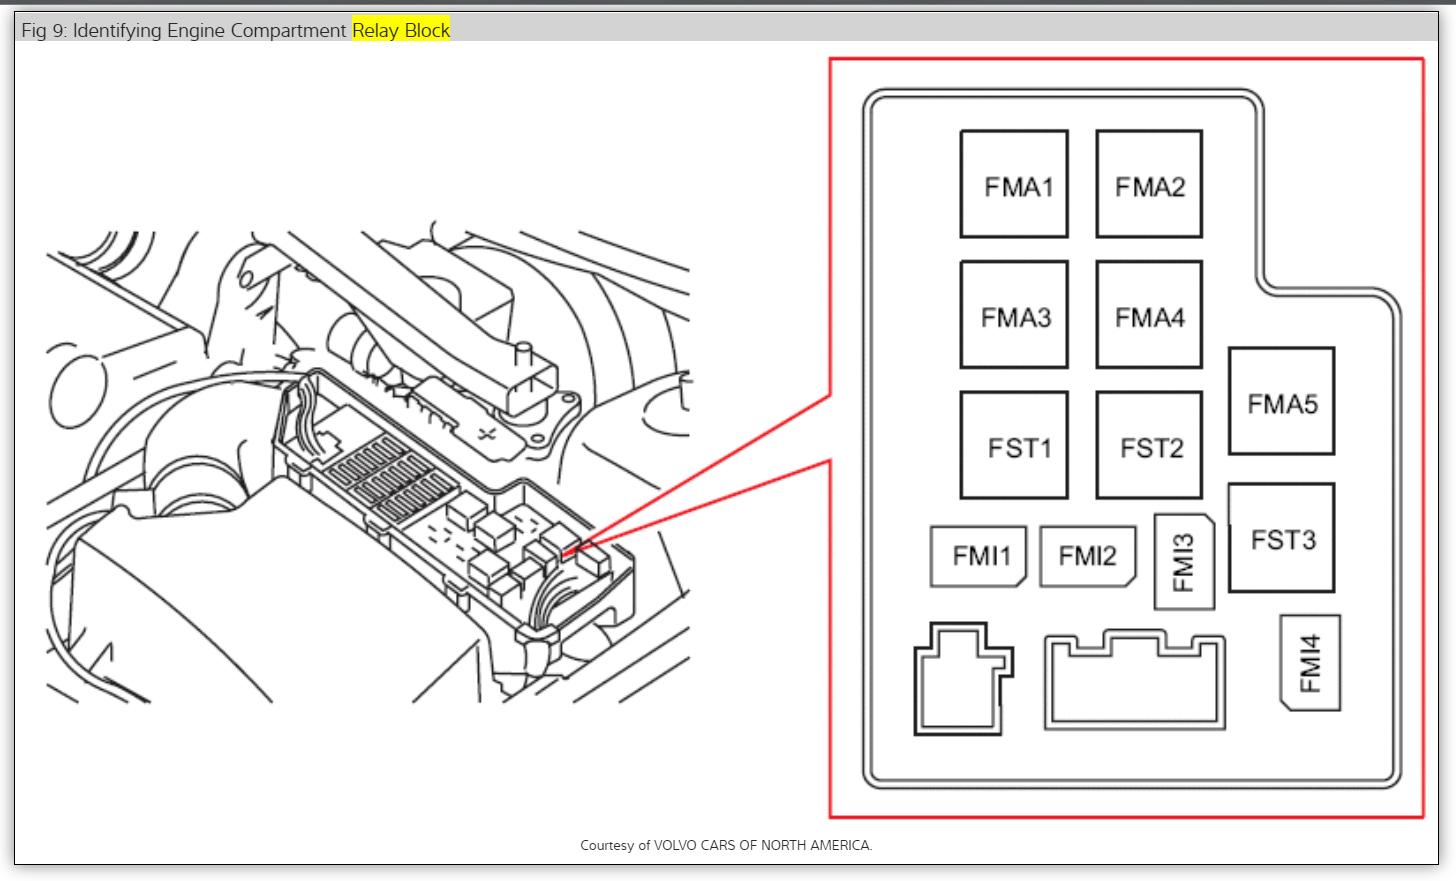 [XOTG_4463]  CL_5369] Kenworth T600 Headlight Wiring Diagram | Kenworth T600 Headlight Wiring Diagram |  | Lopla Numap Mohammedshrine Librar Wiring 101